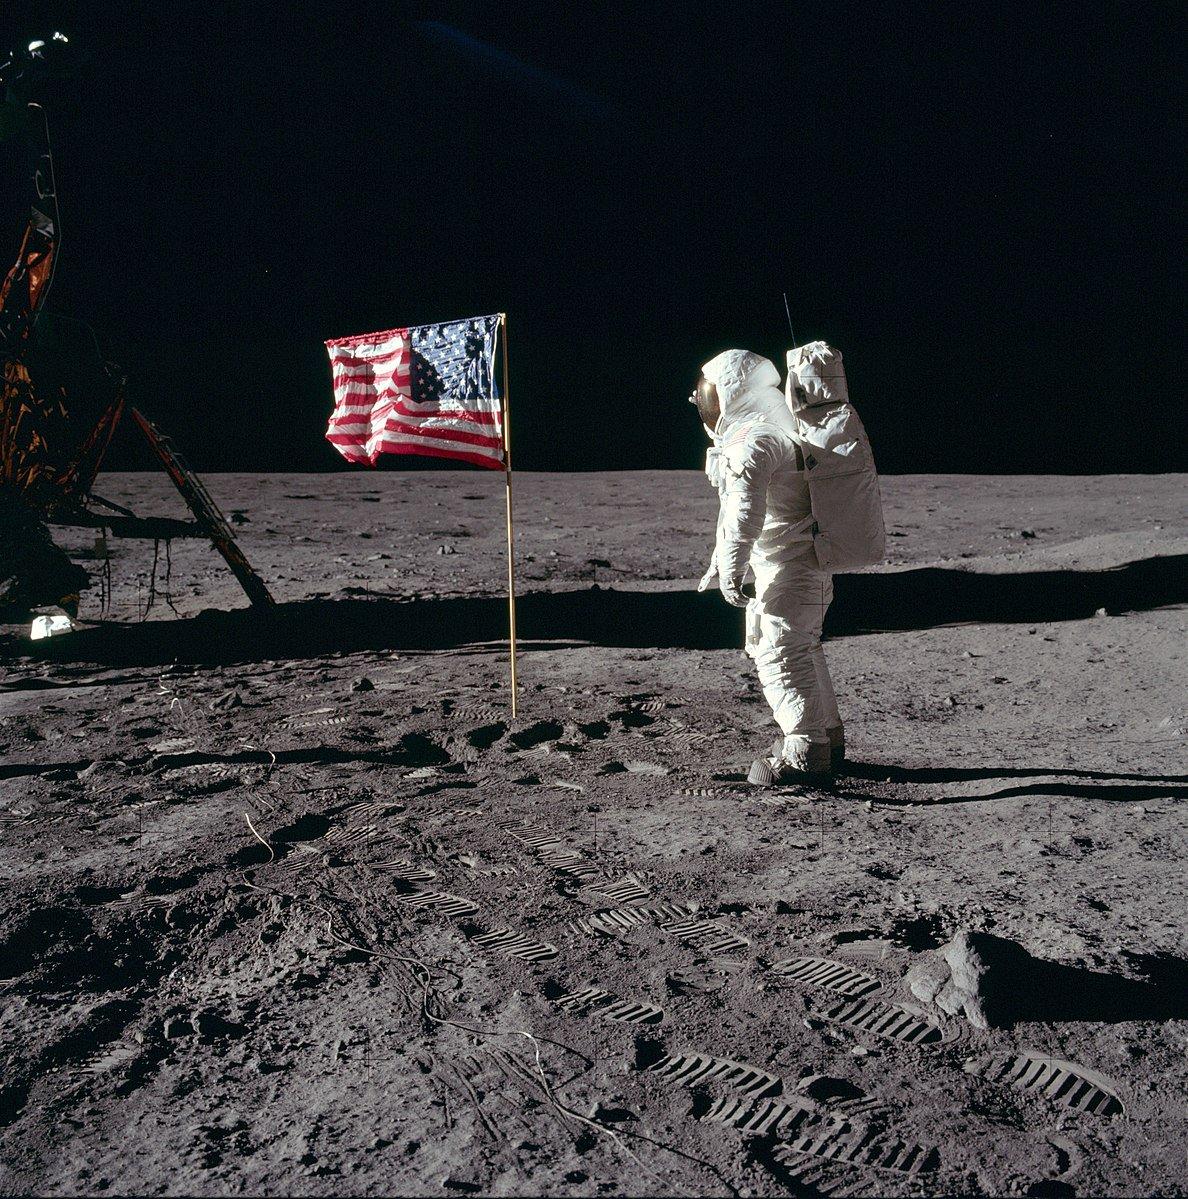 Dl7hZb0XoAAOccz - The Moon 1969